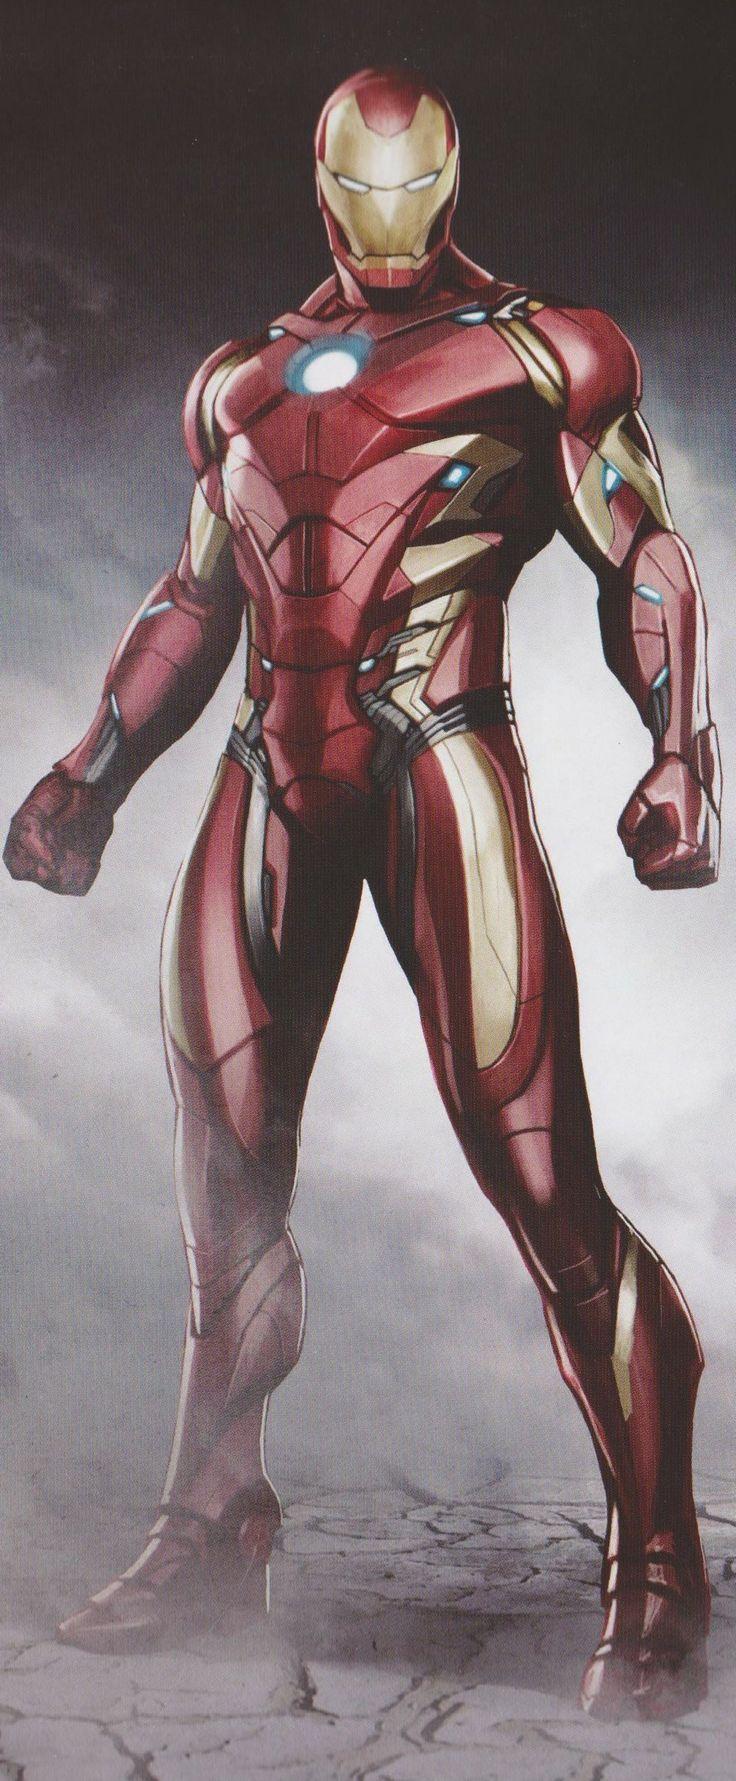 Iron Man Mark 50 Concept Art My Blog Iron Man Drawing Iron Man Avengers Iron Man Art